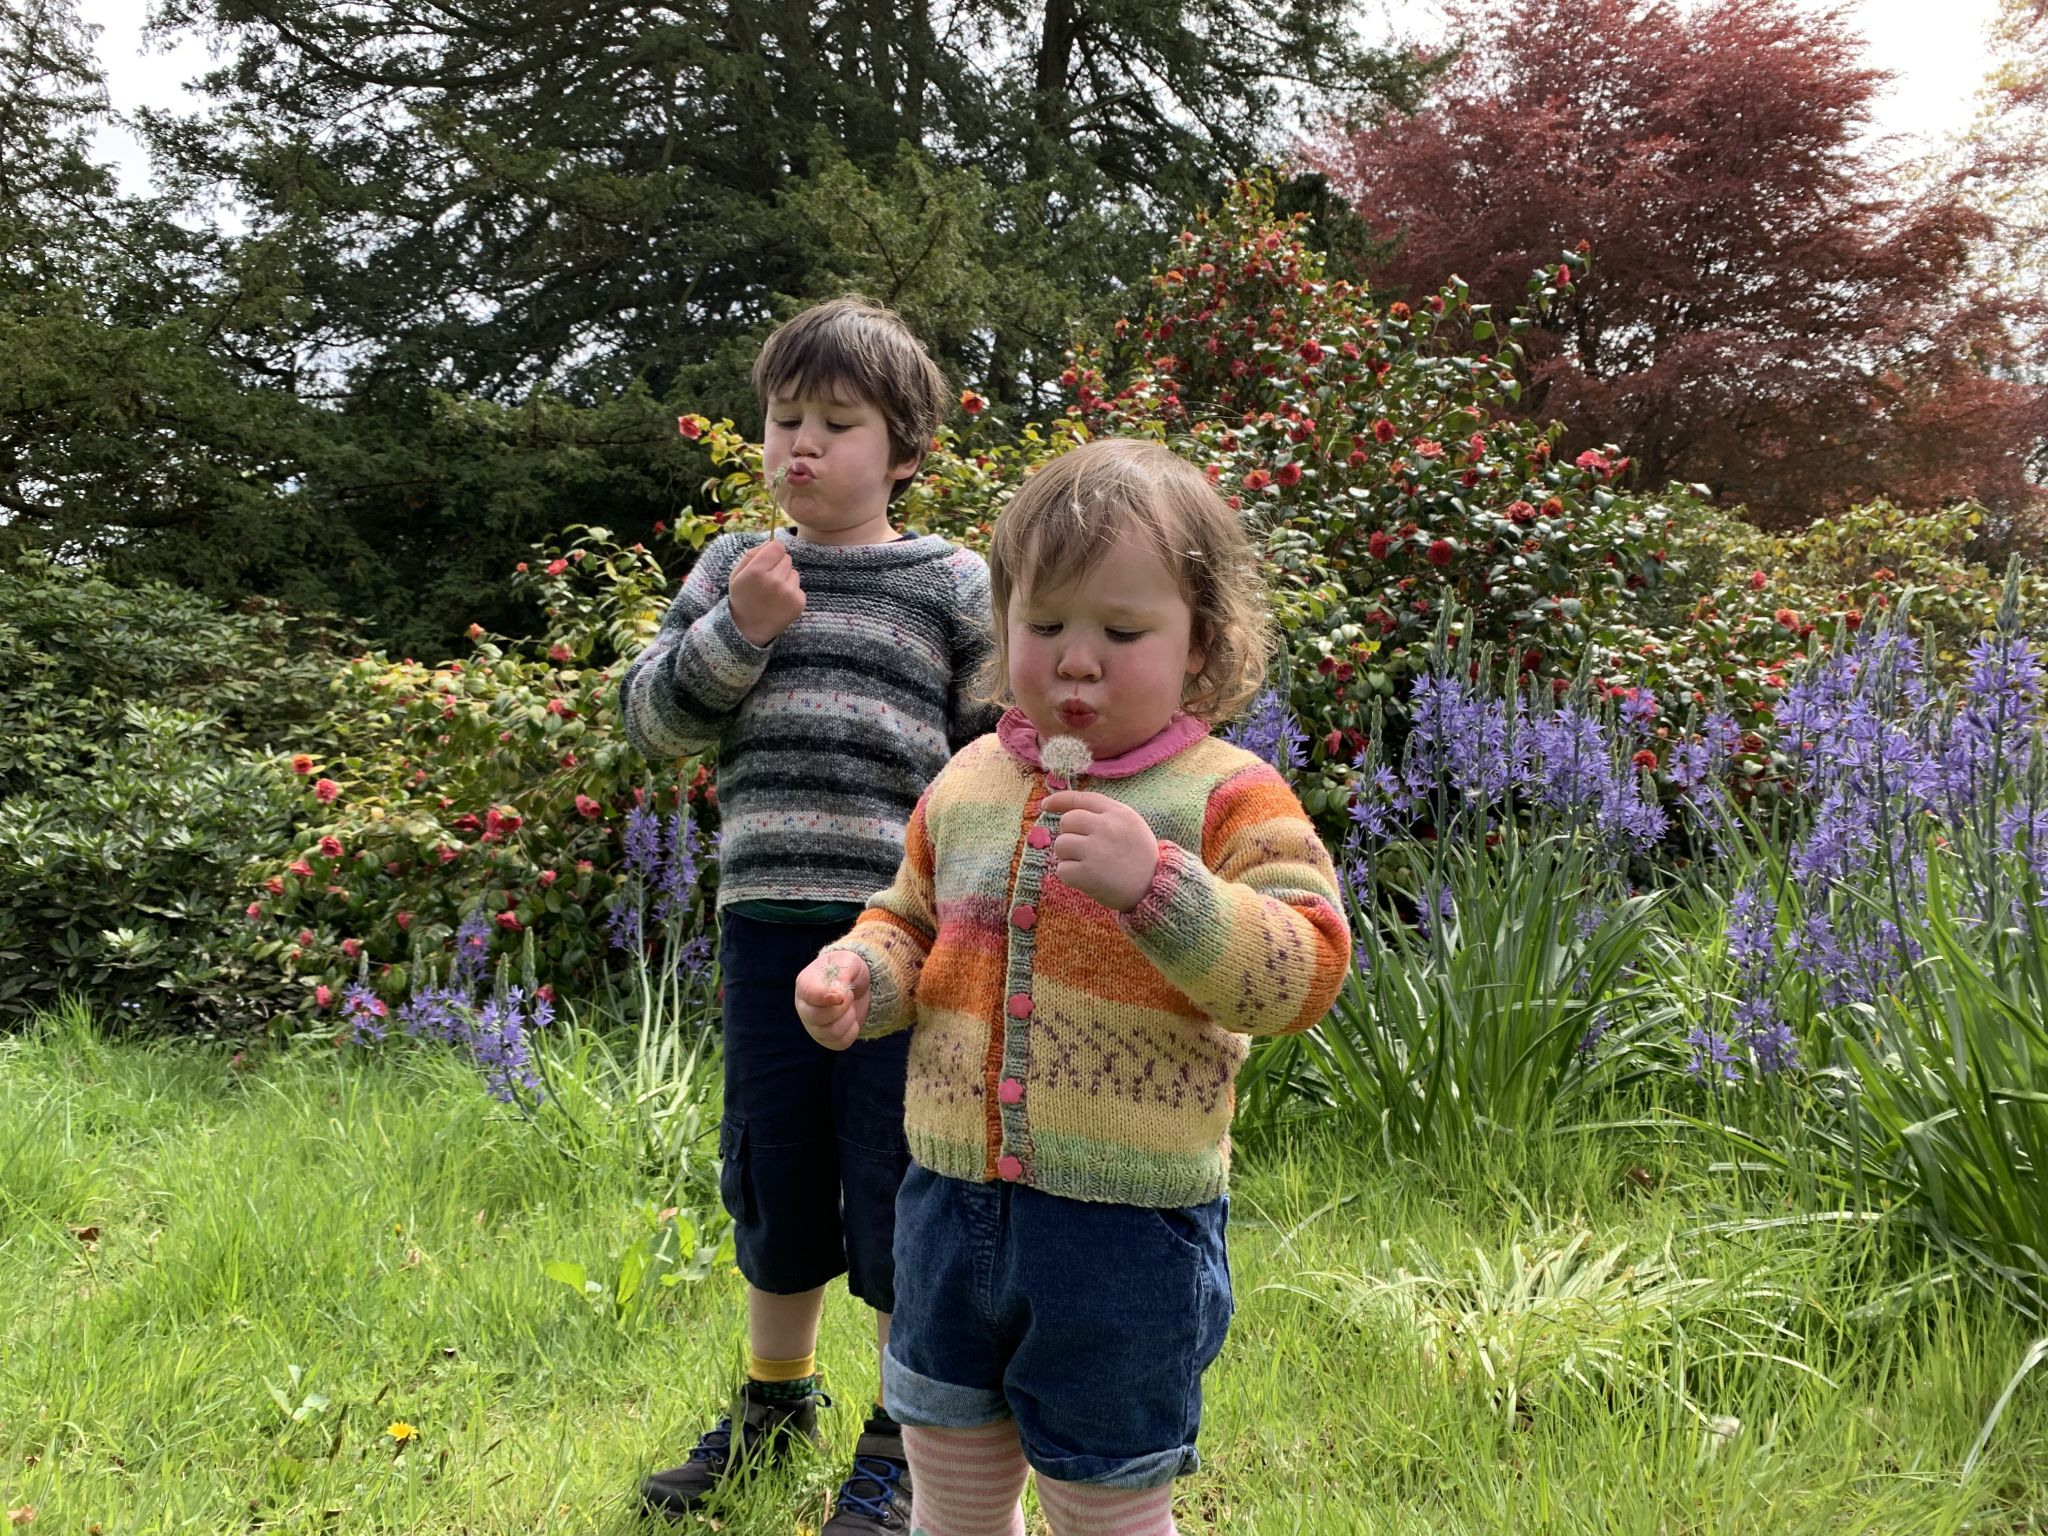 two children blowing dandelion clocks